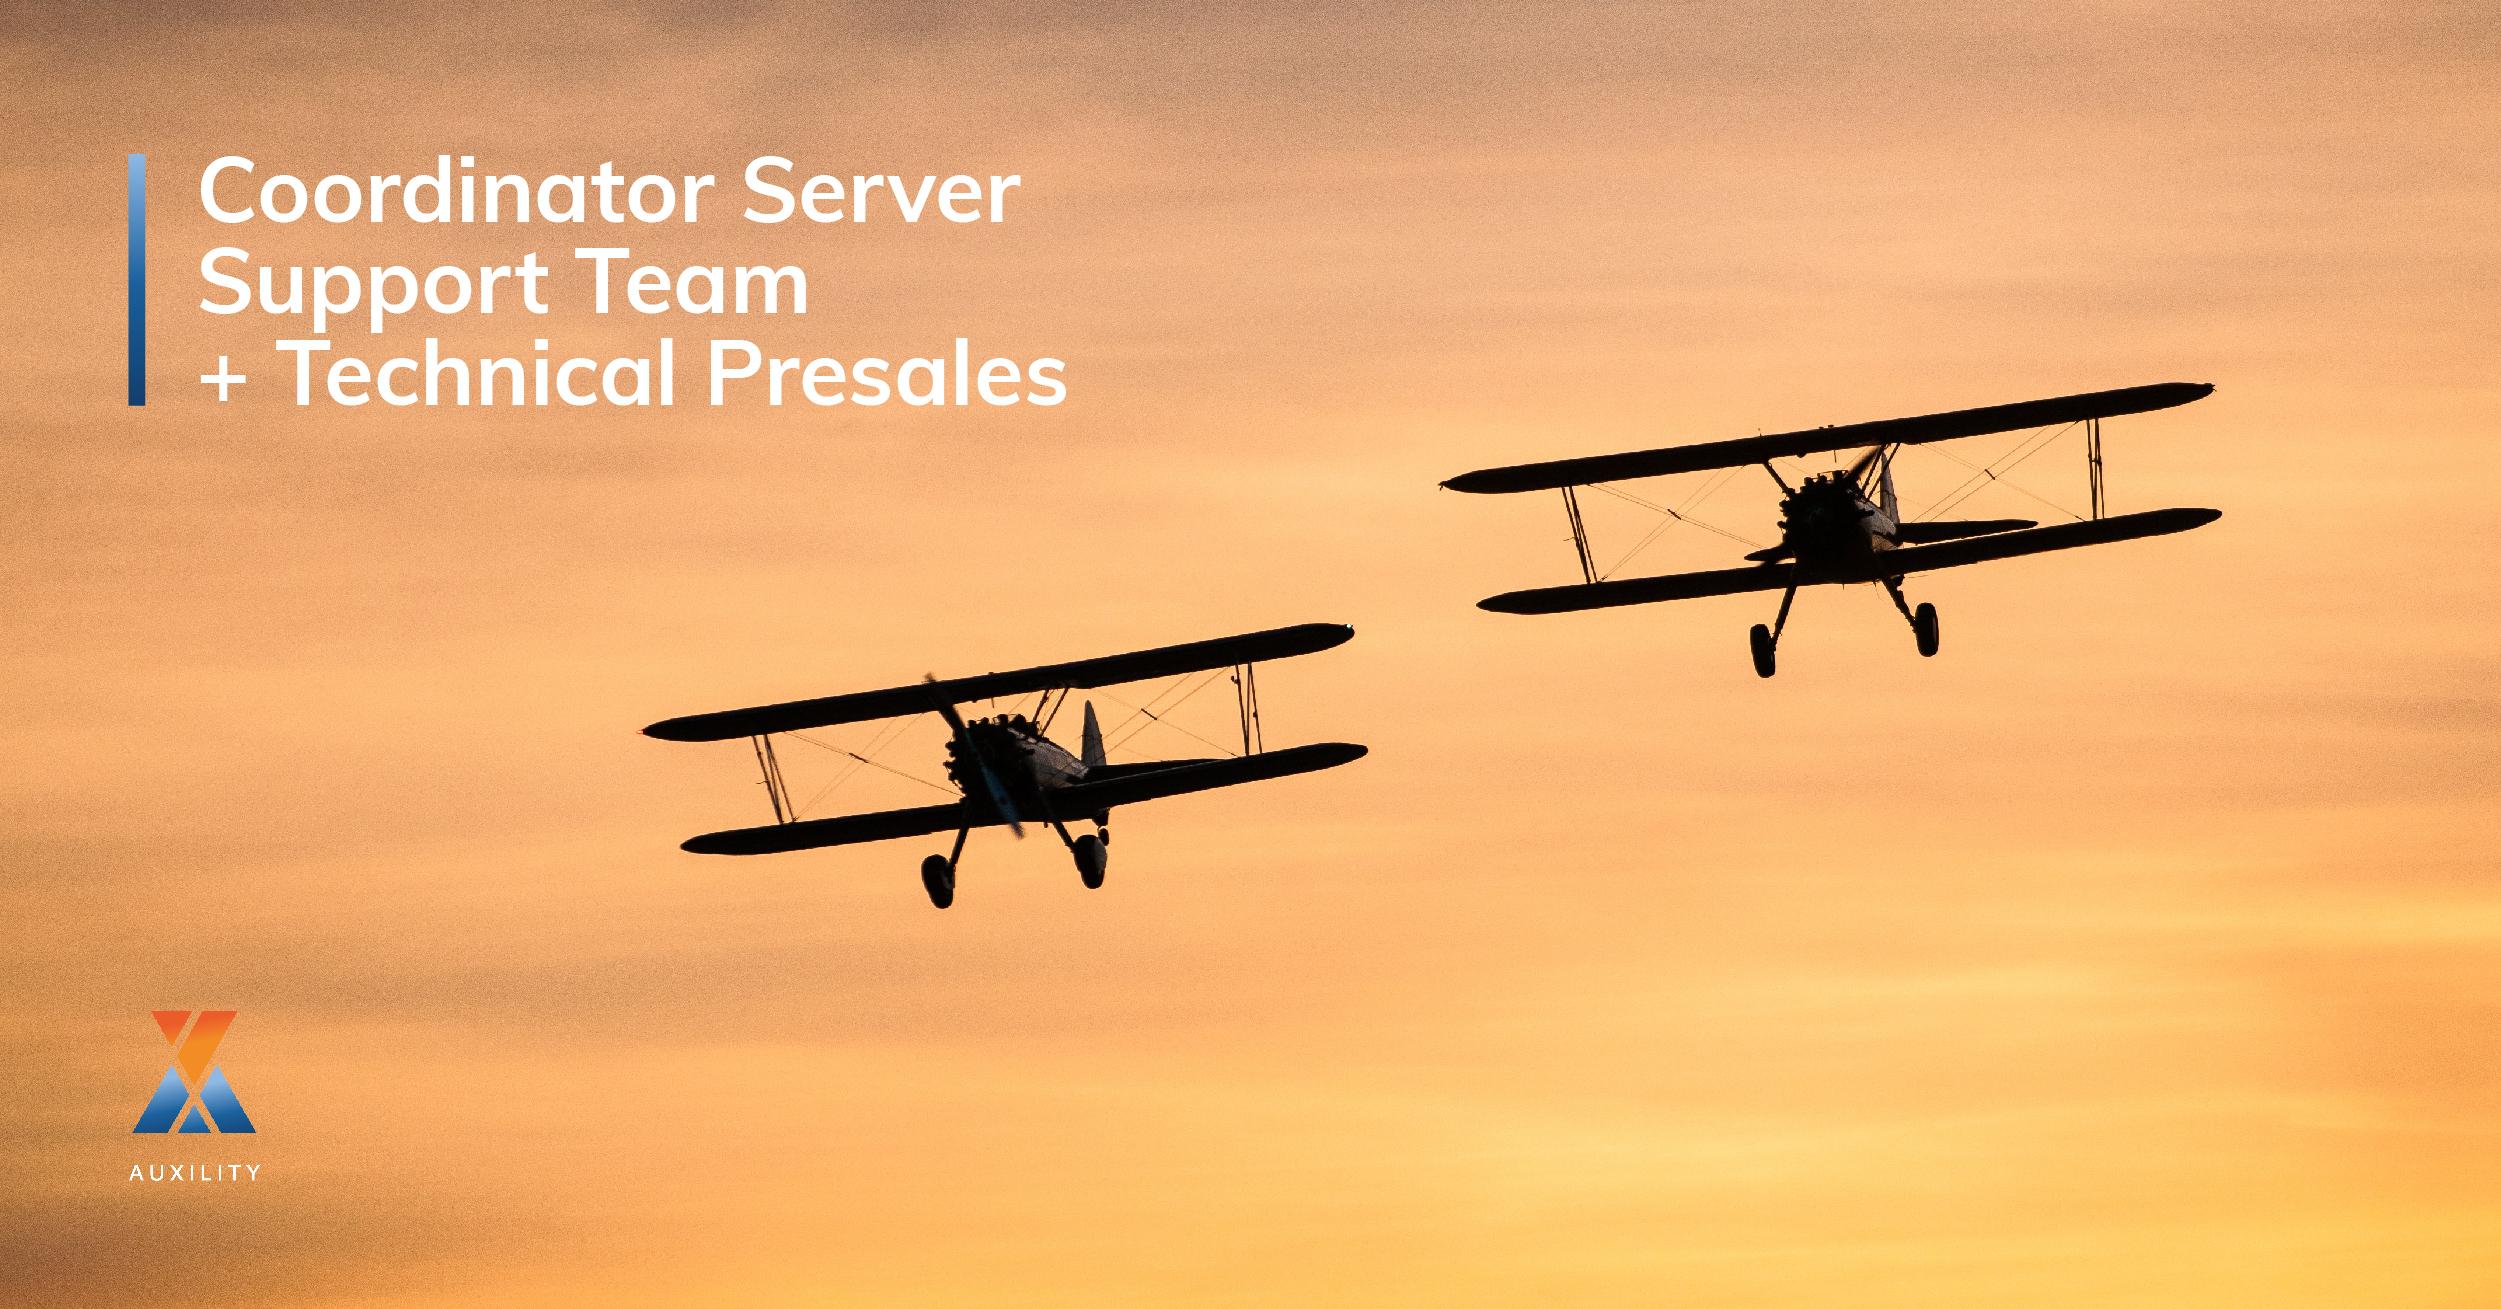 Coordinator Server Support Team + Technical Presales